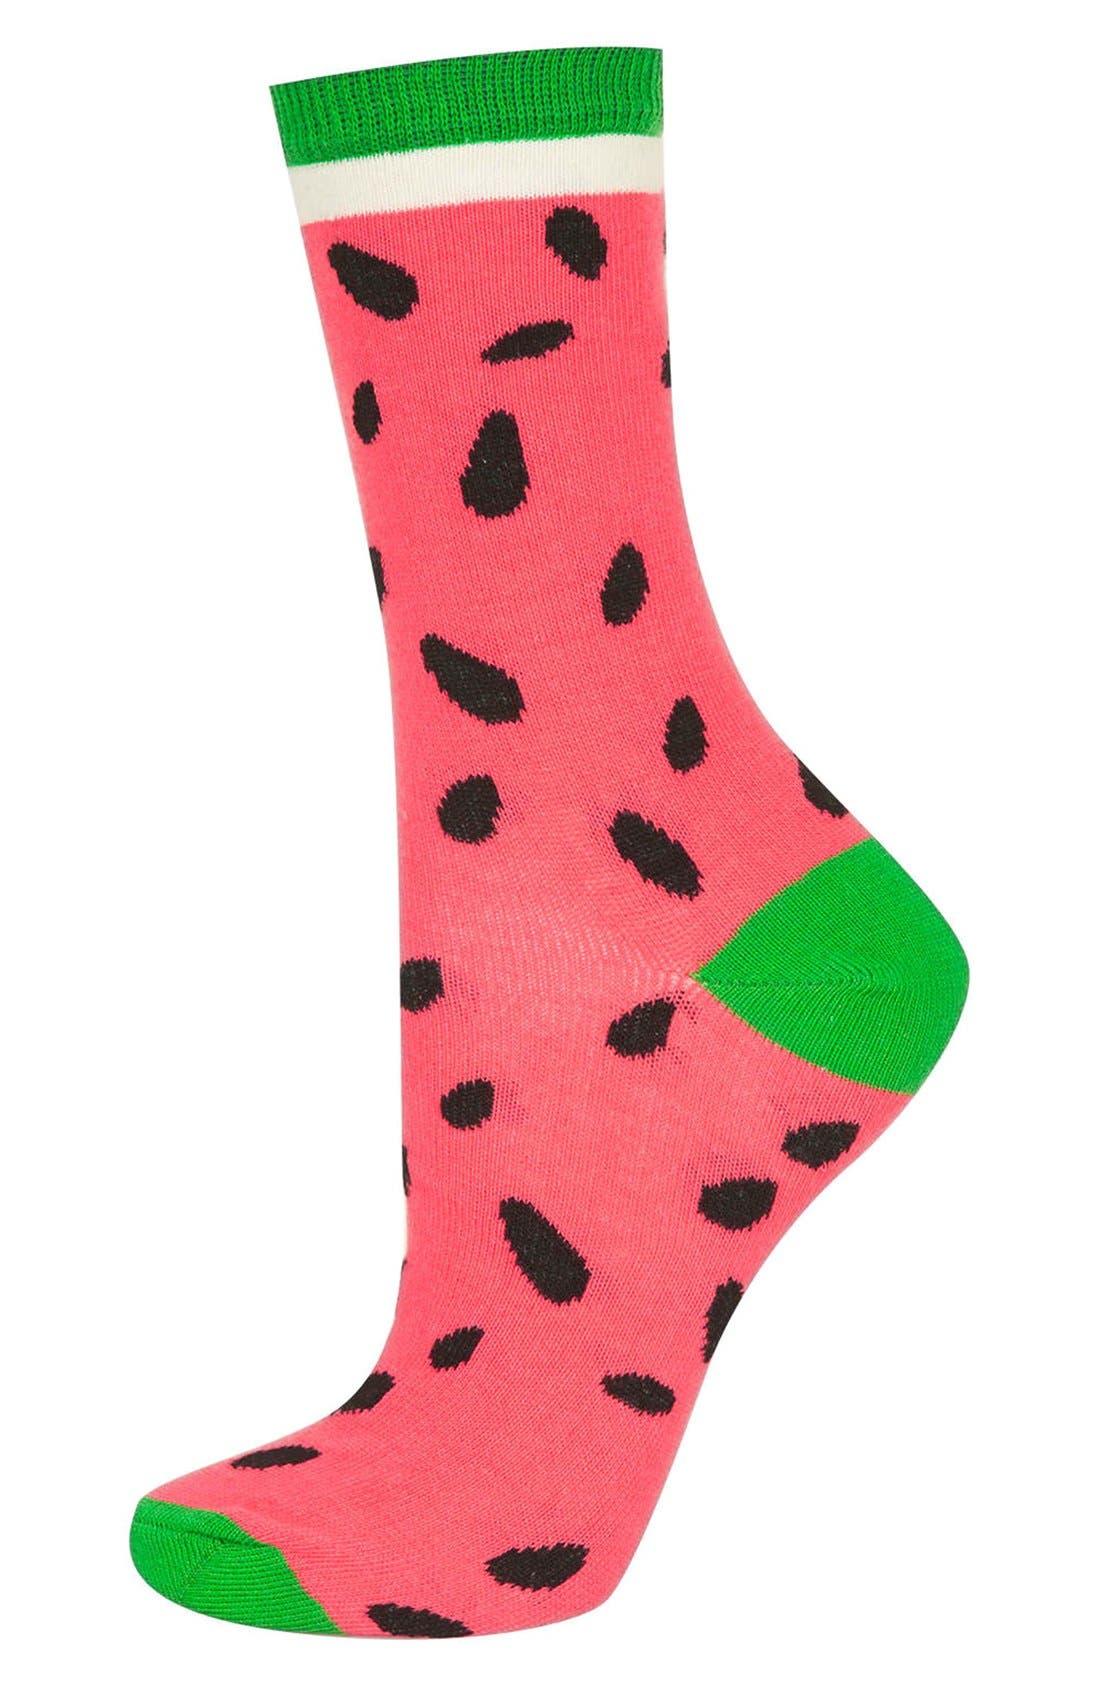 Watermelon Ankle Socks,                             Main thumbnail 1, color,                             950